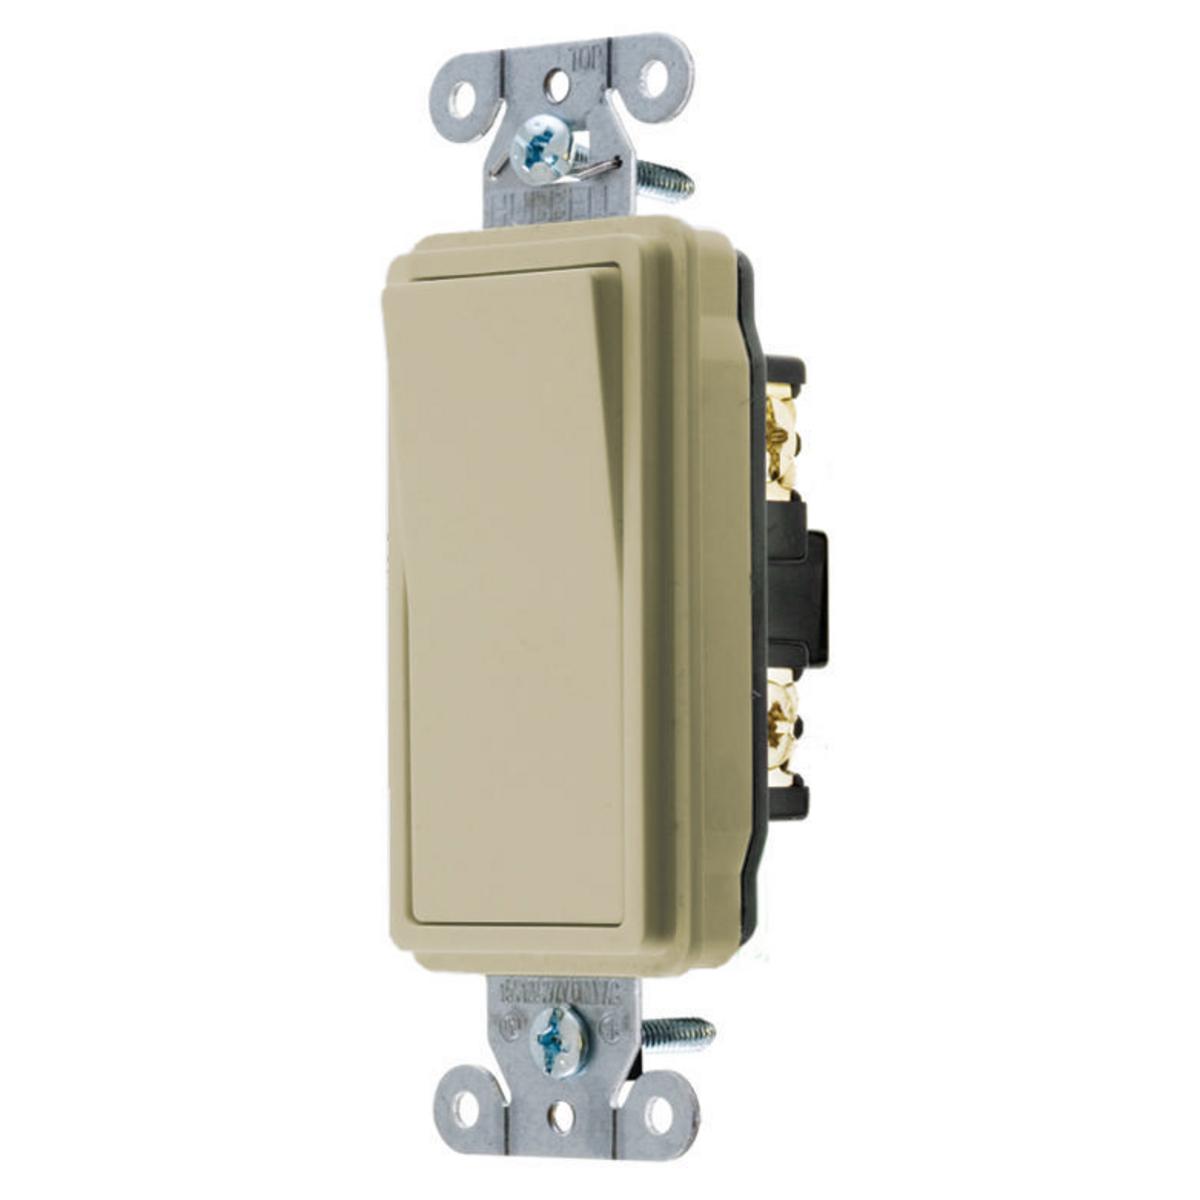 Hubbell DS115I 15 Amp 120/277 VAC 1-Pole Ivory Rocker Switch